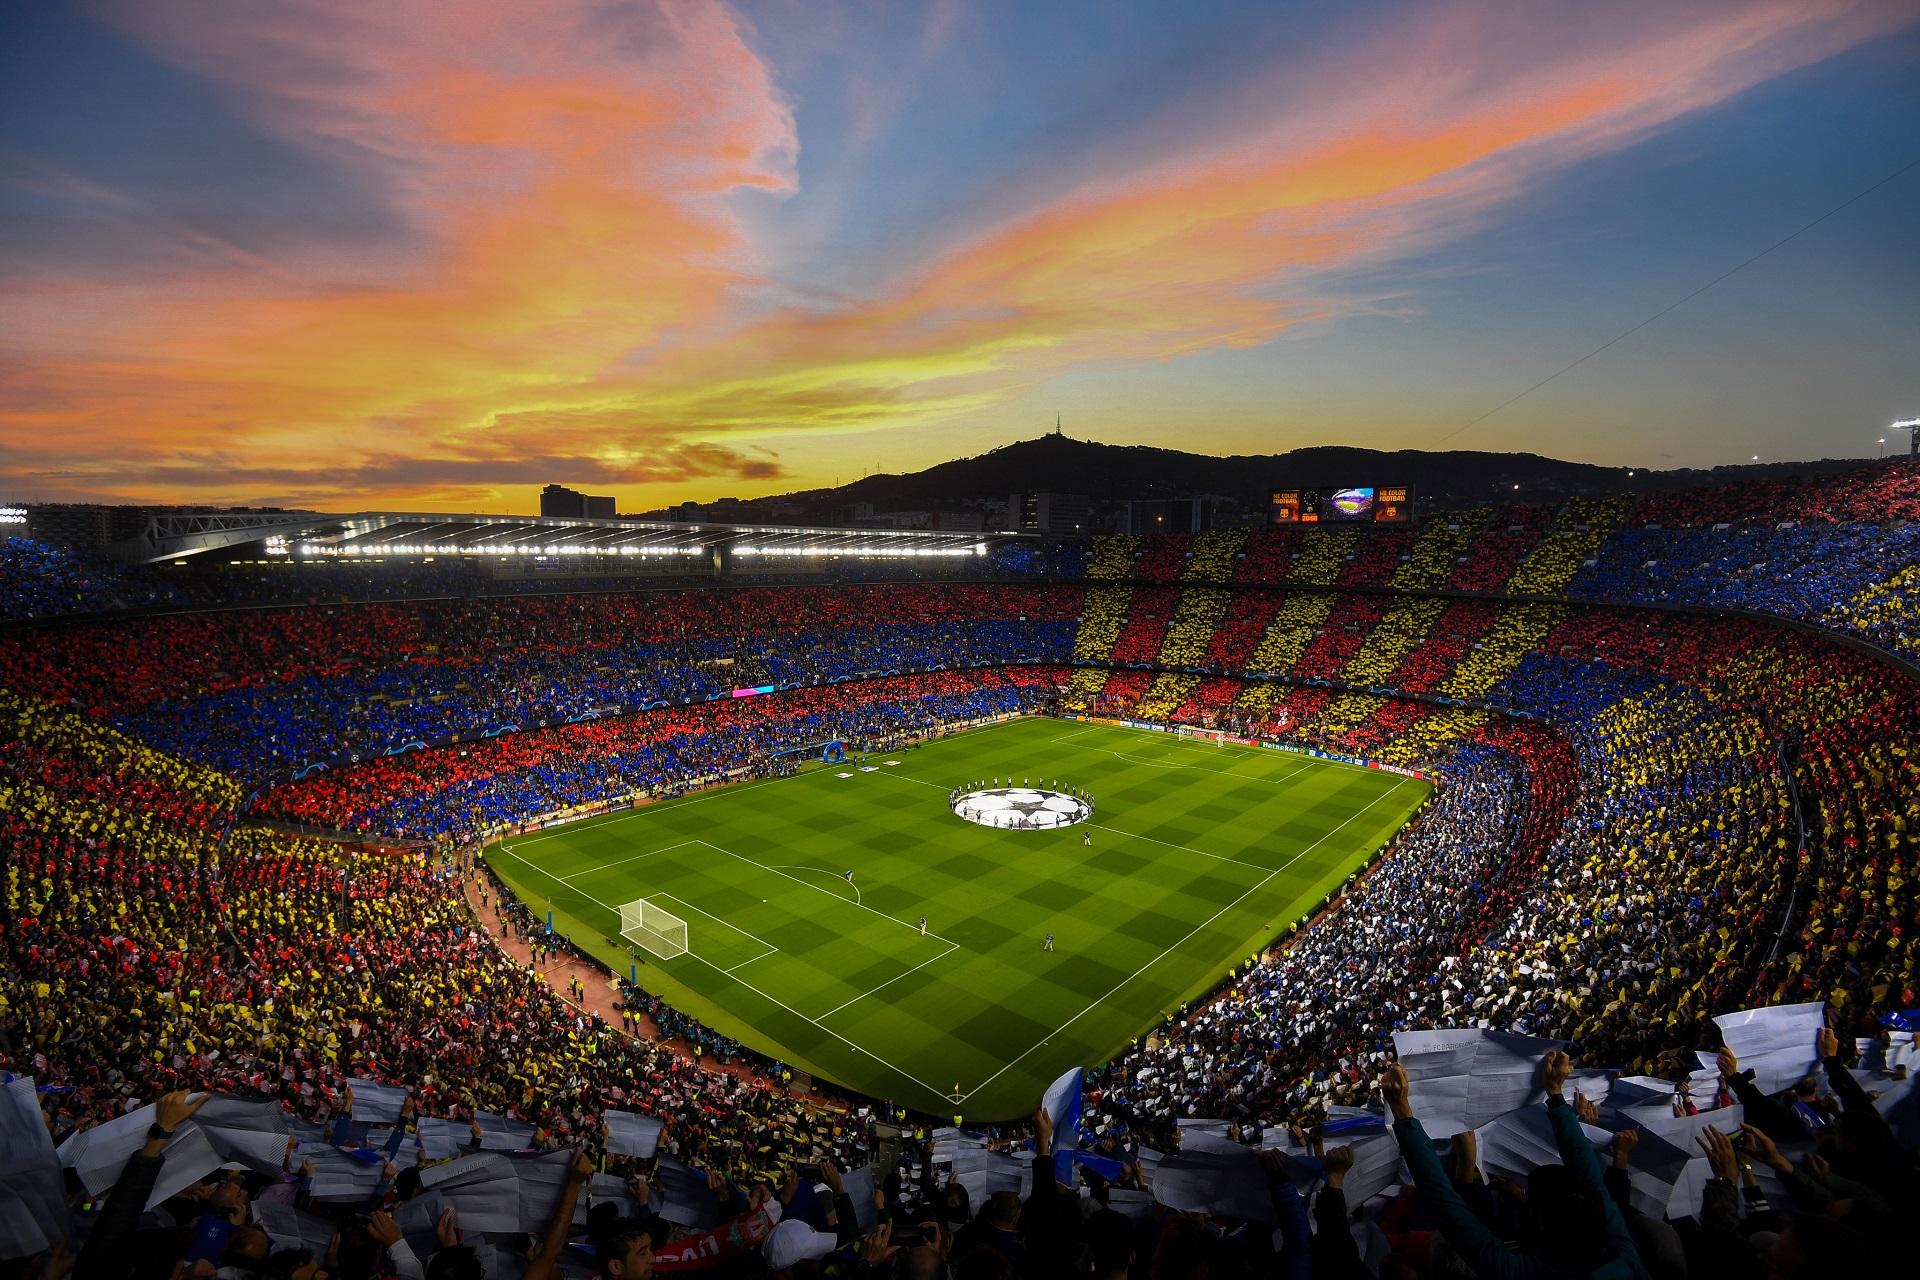 General 1920x1280 FC Barcelona Spain stadium Camp Nou soccer soccer field soccer clubs Champions League sunset